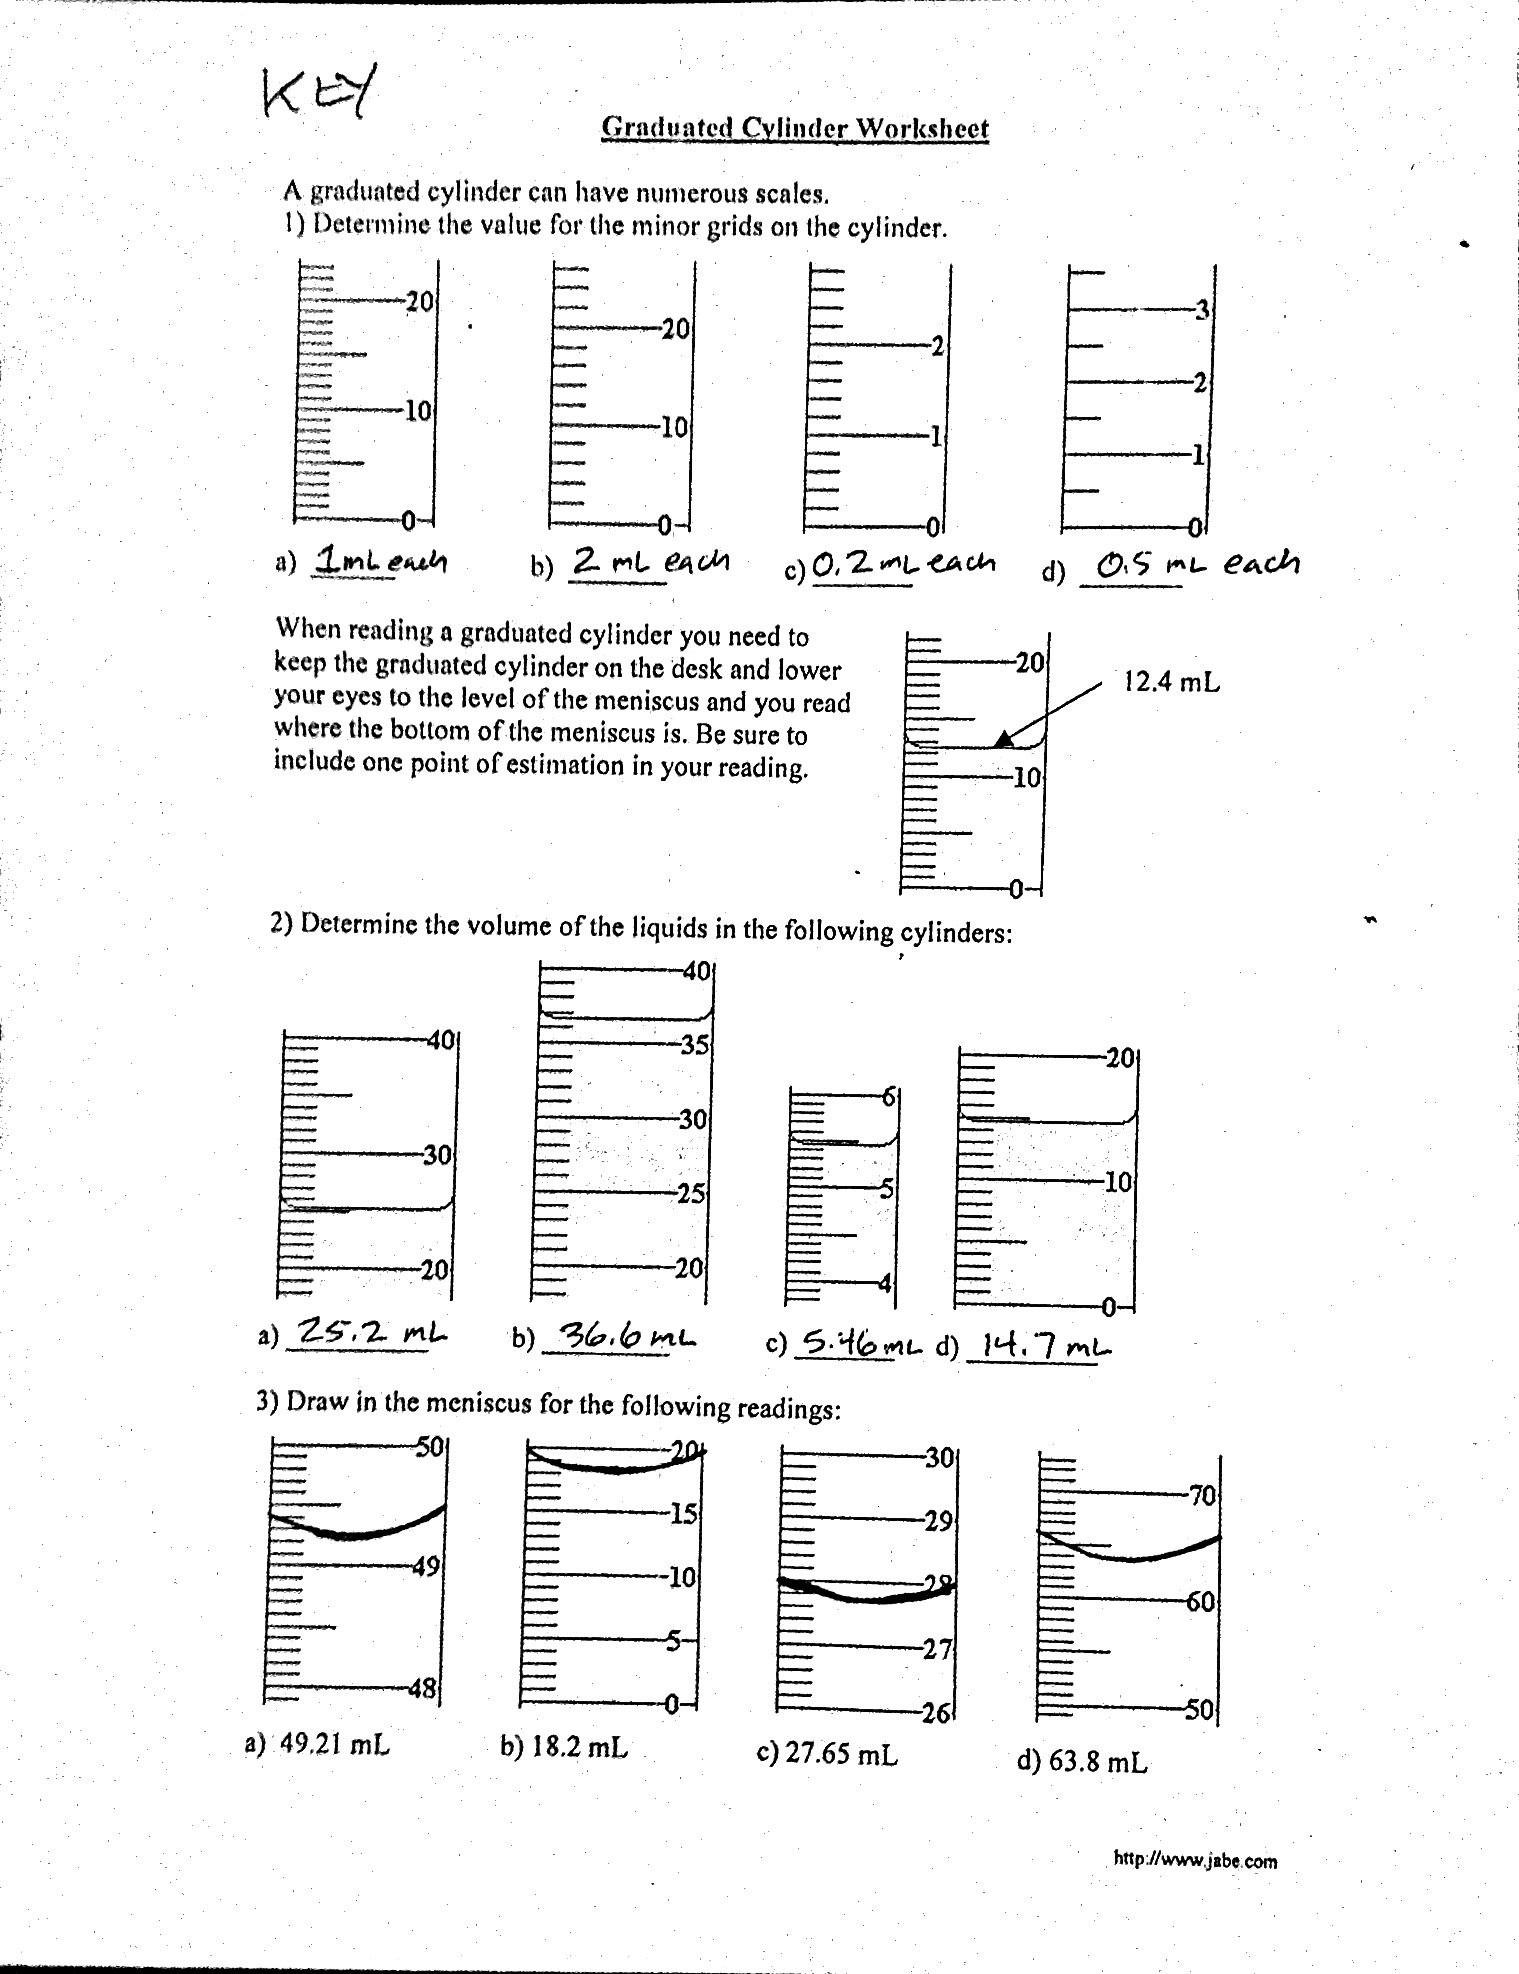 Reading Graduated Cylinders Worksheet